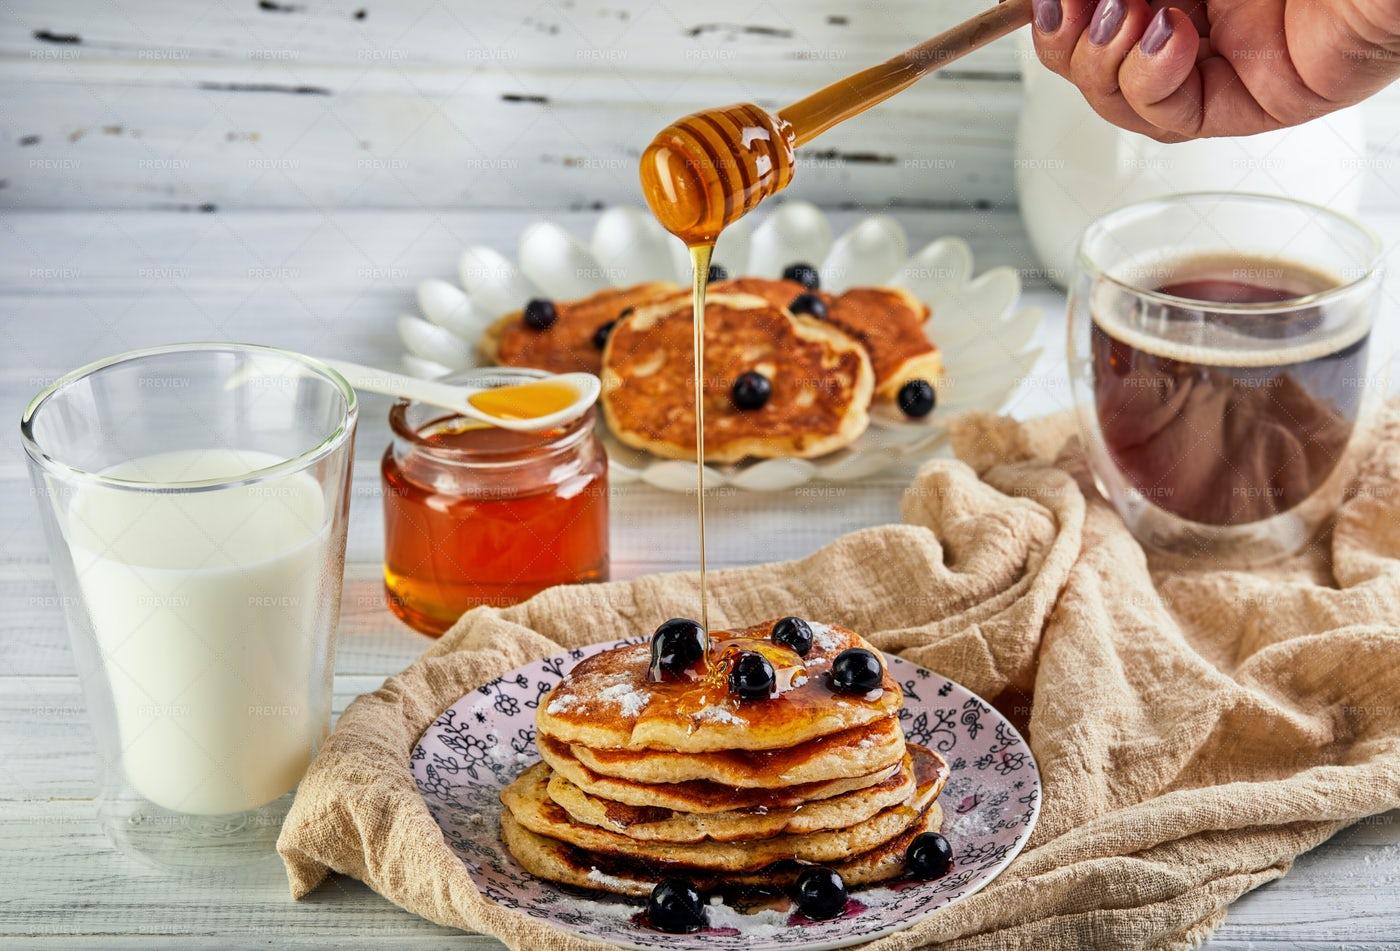 Honey On The Pancakes: Stock Photos